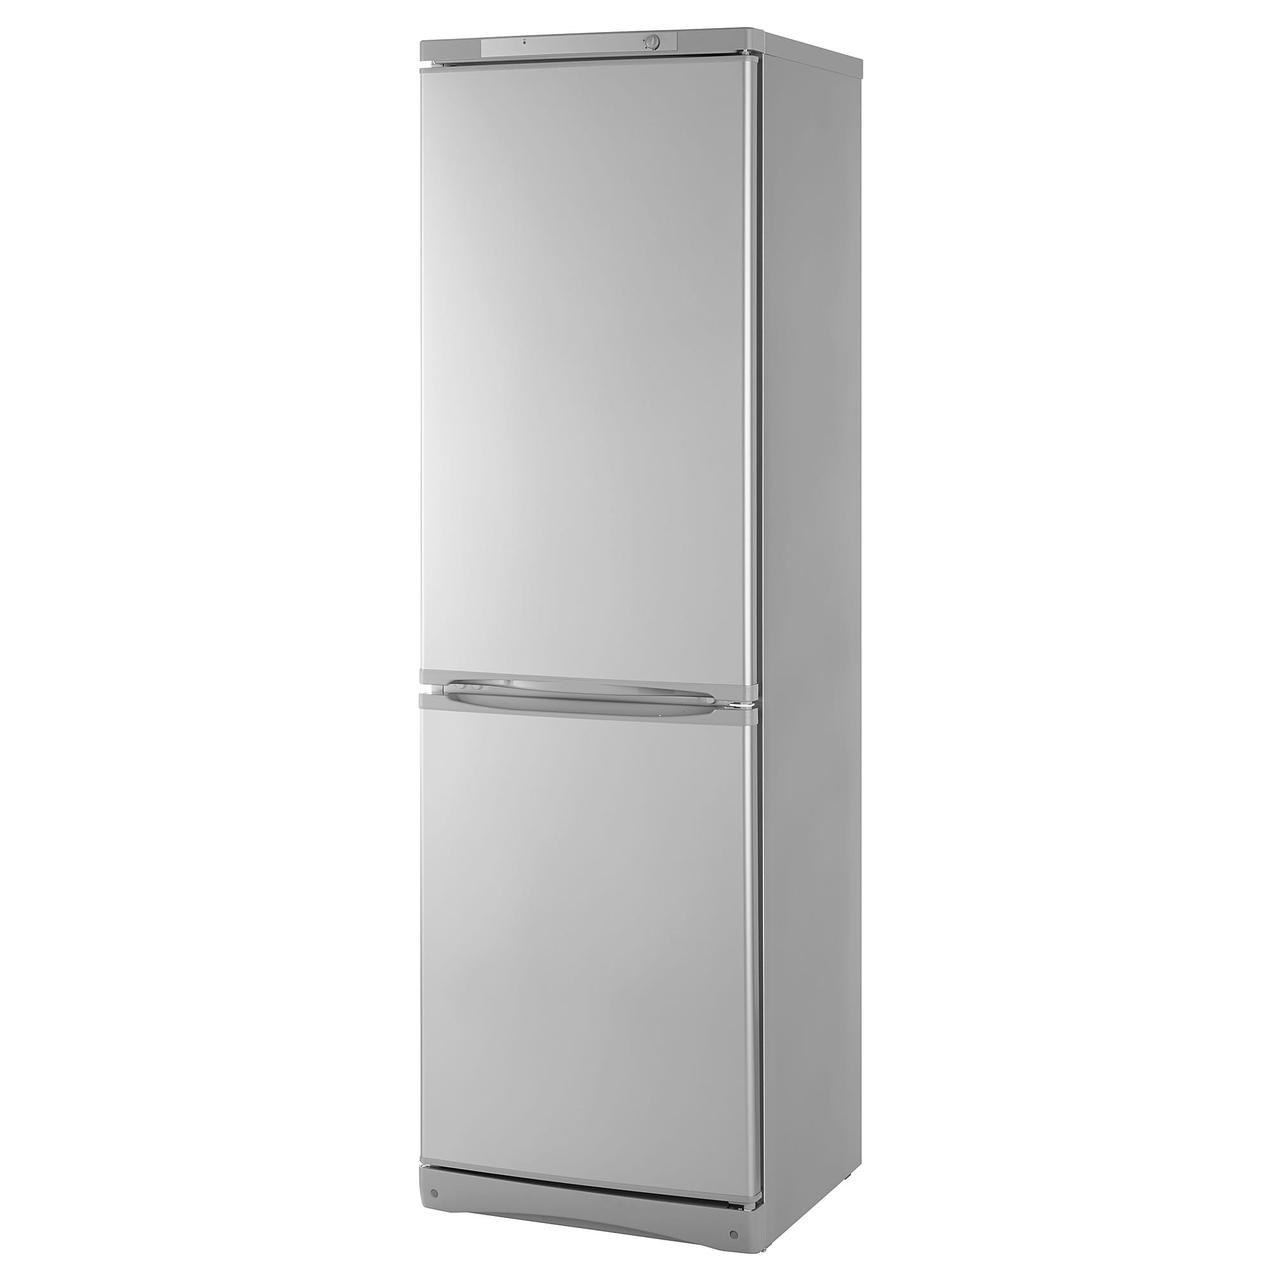 НЕДИСАД Холодильник/ морозильник, серебристый